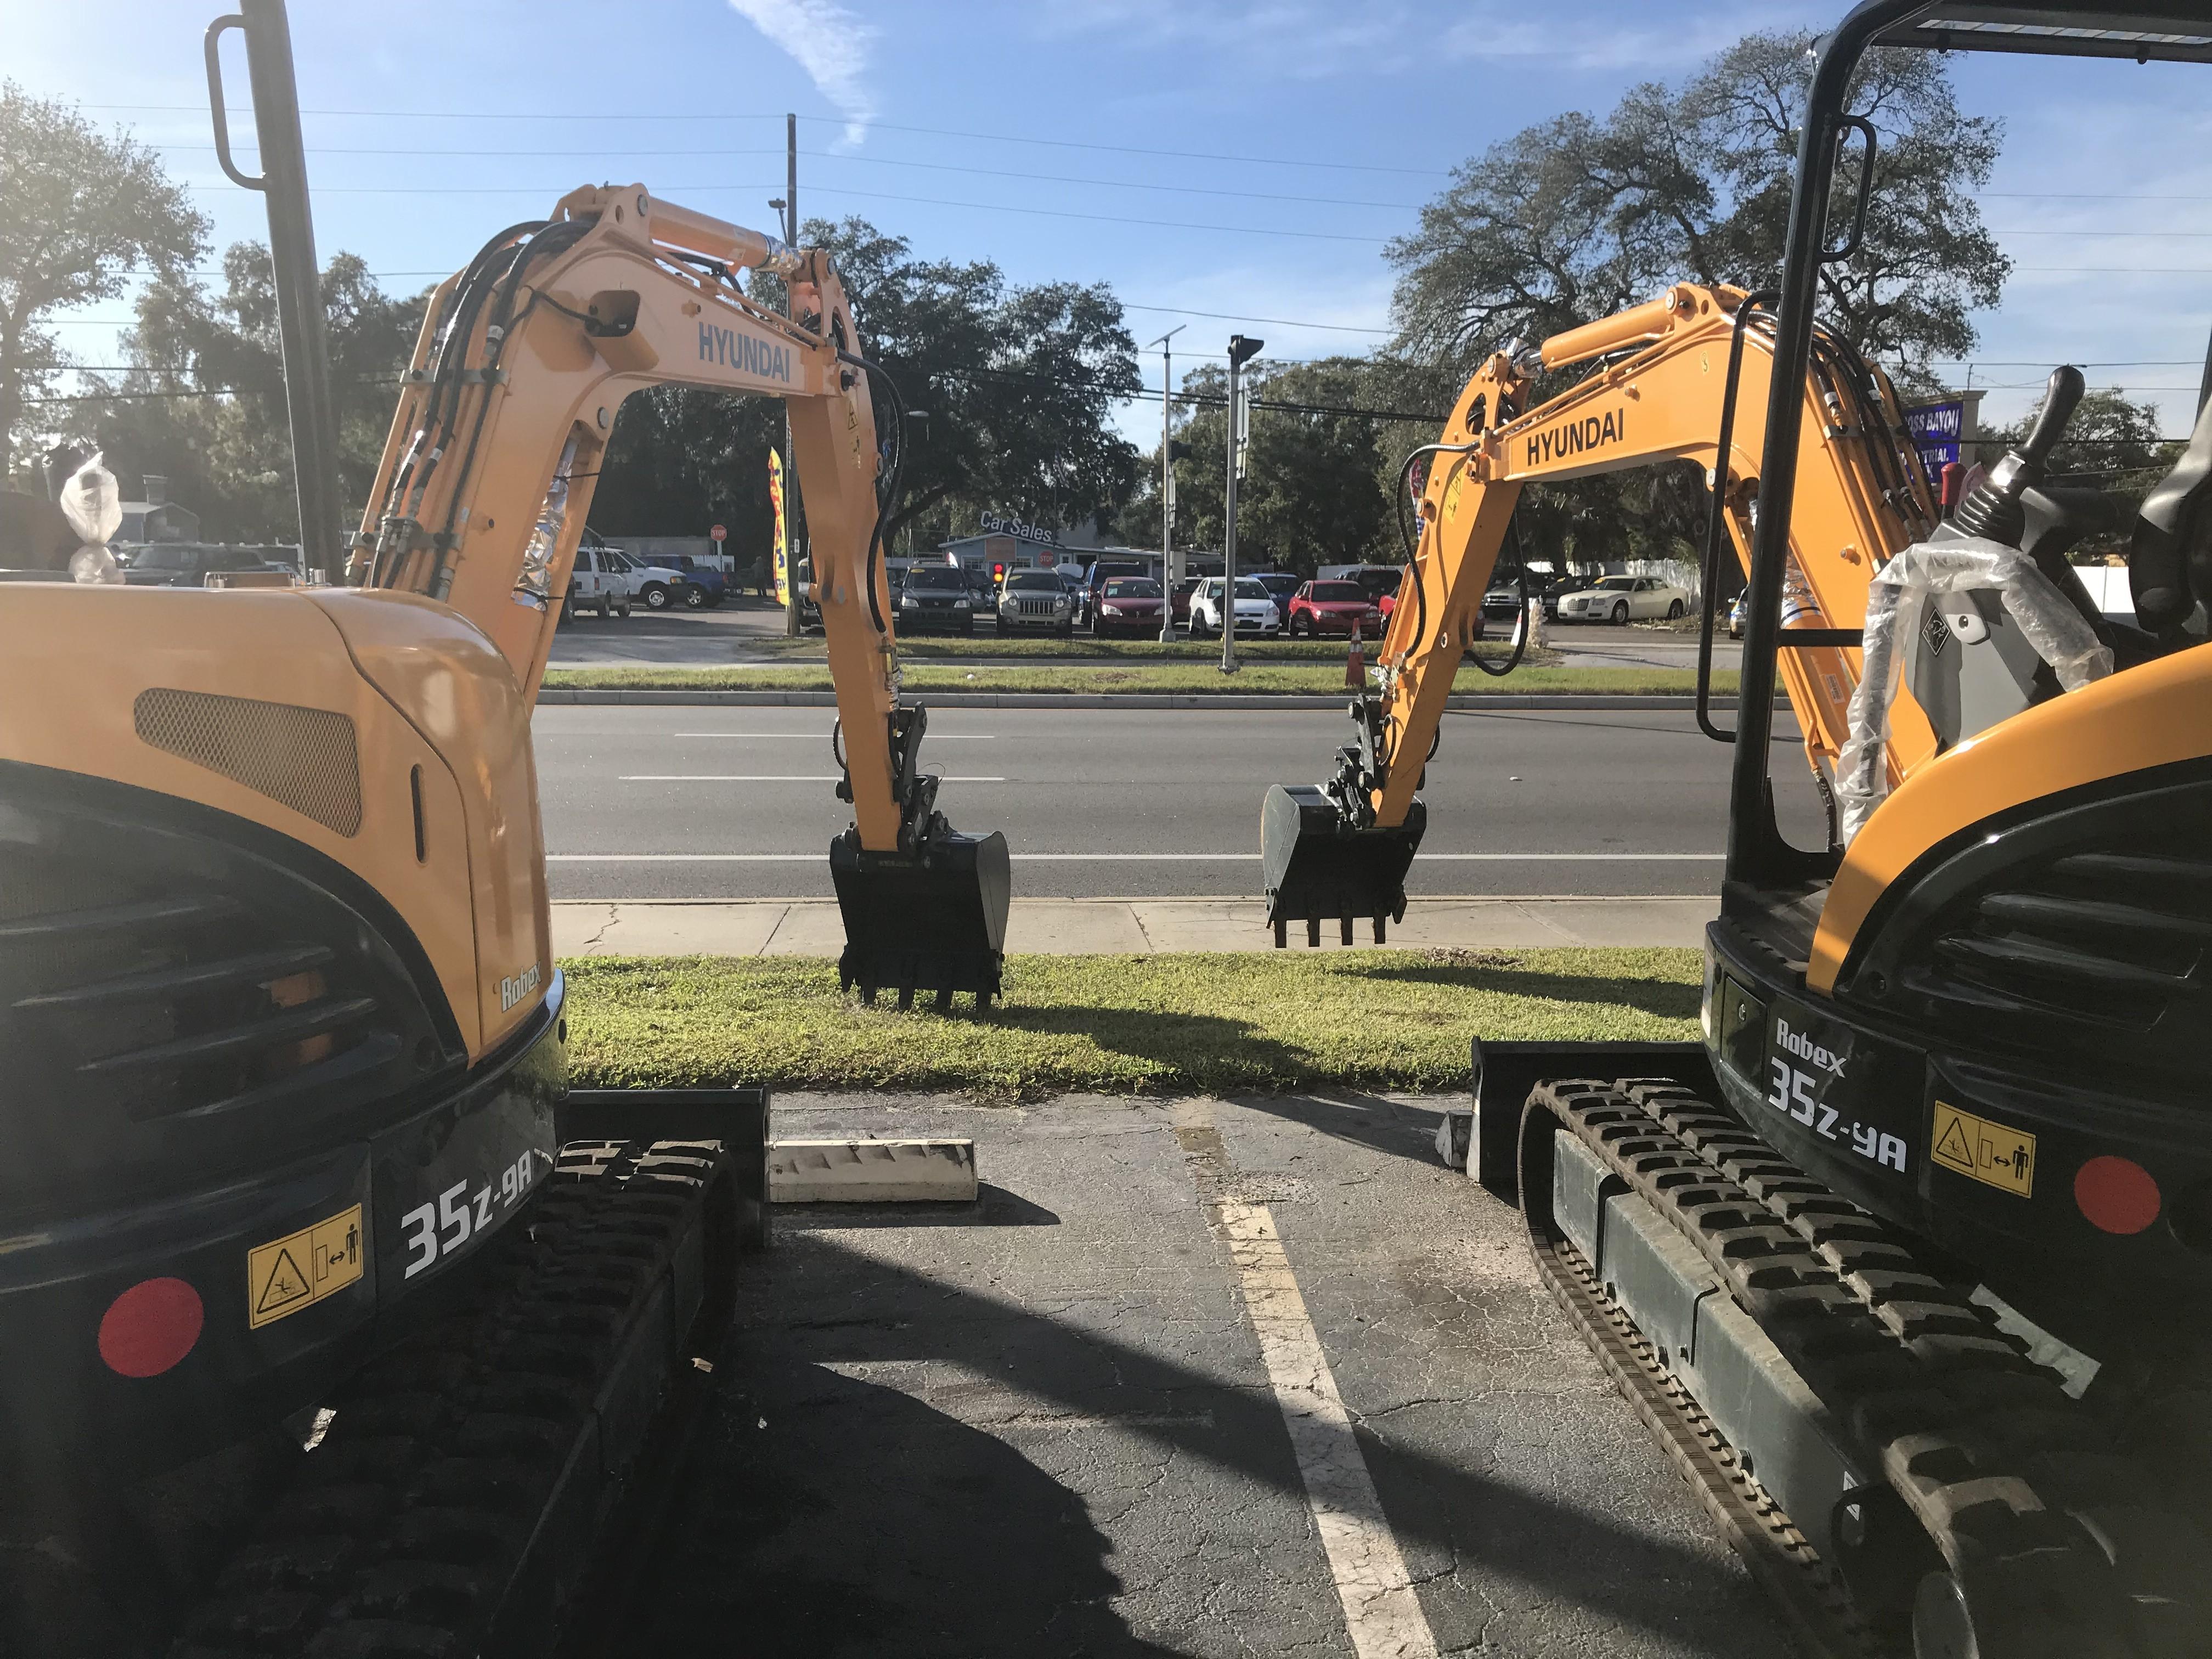 Used, 2017, Hyundai, R35Z-9A, Excavators